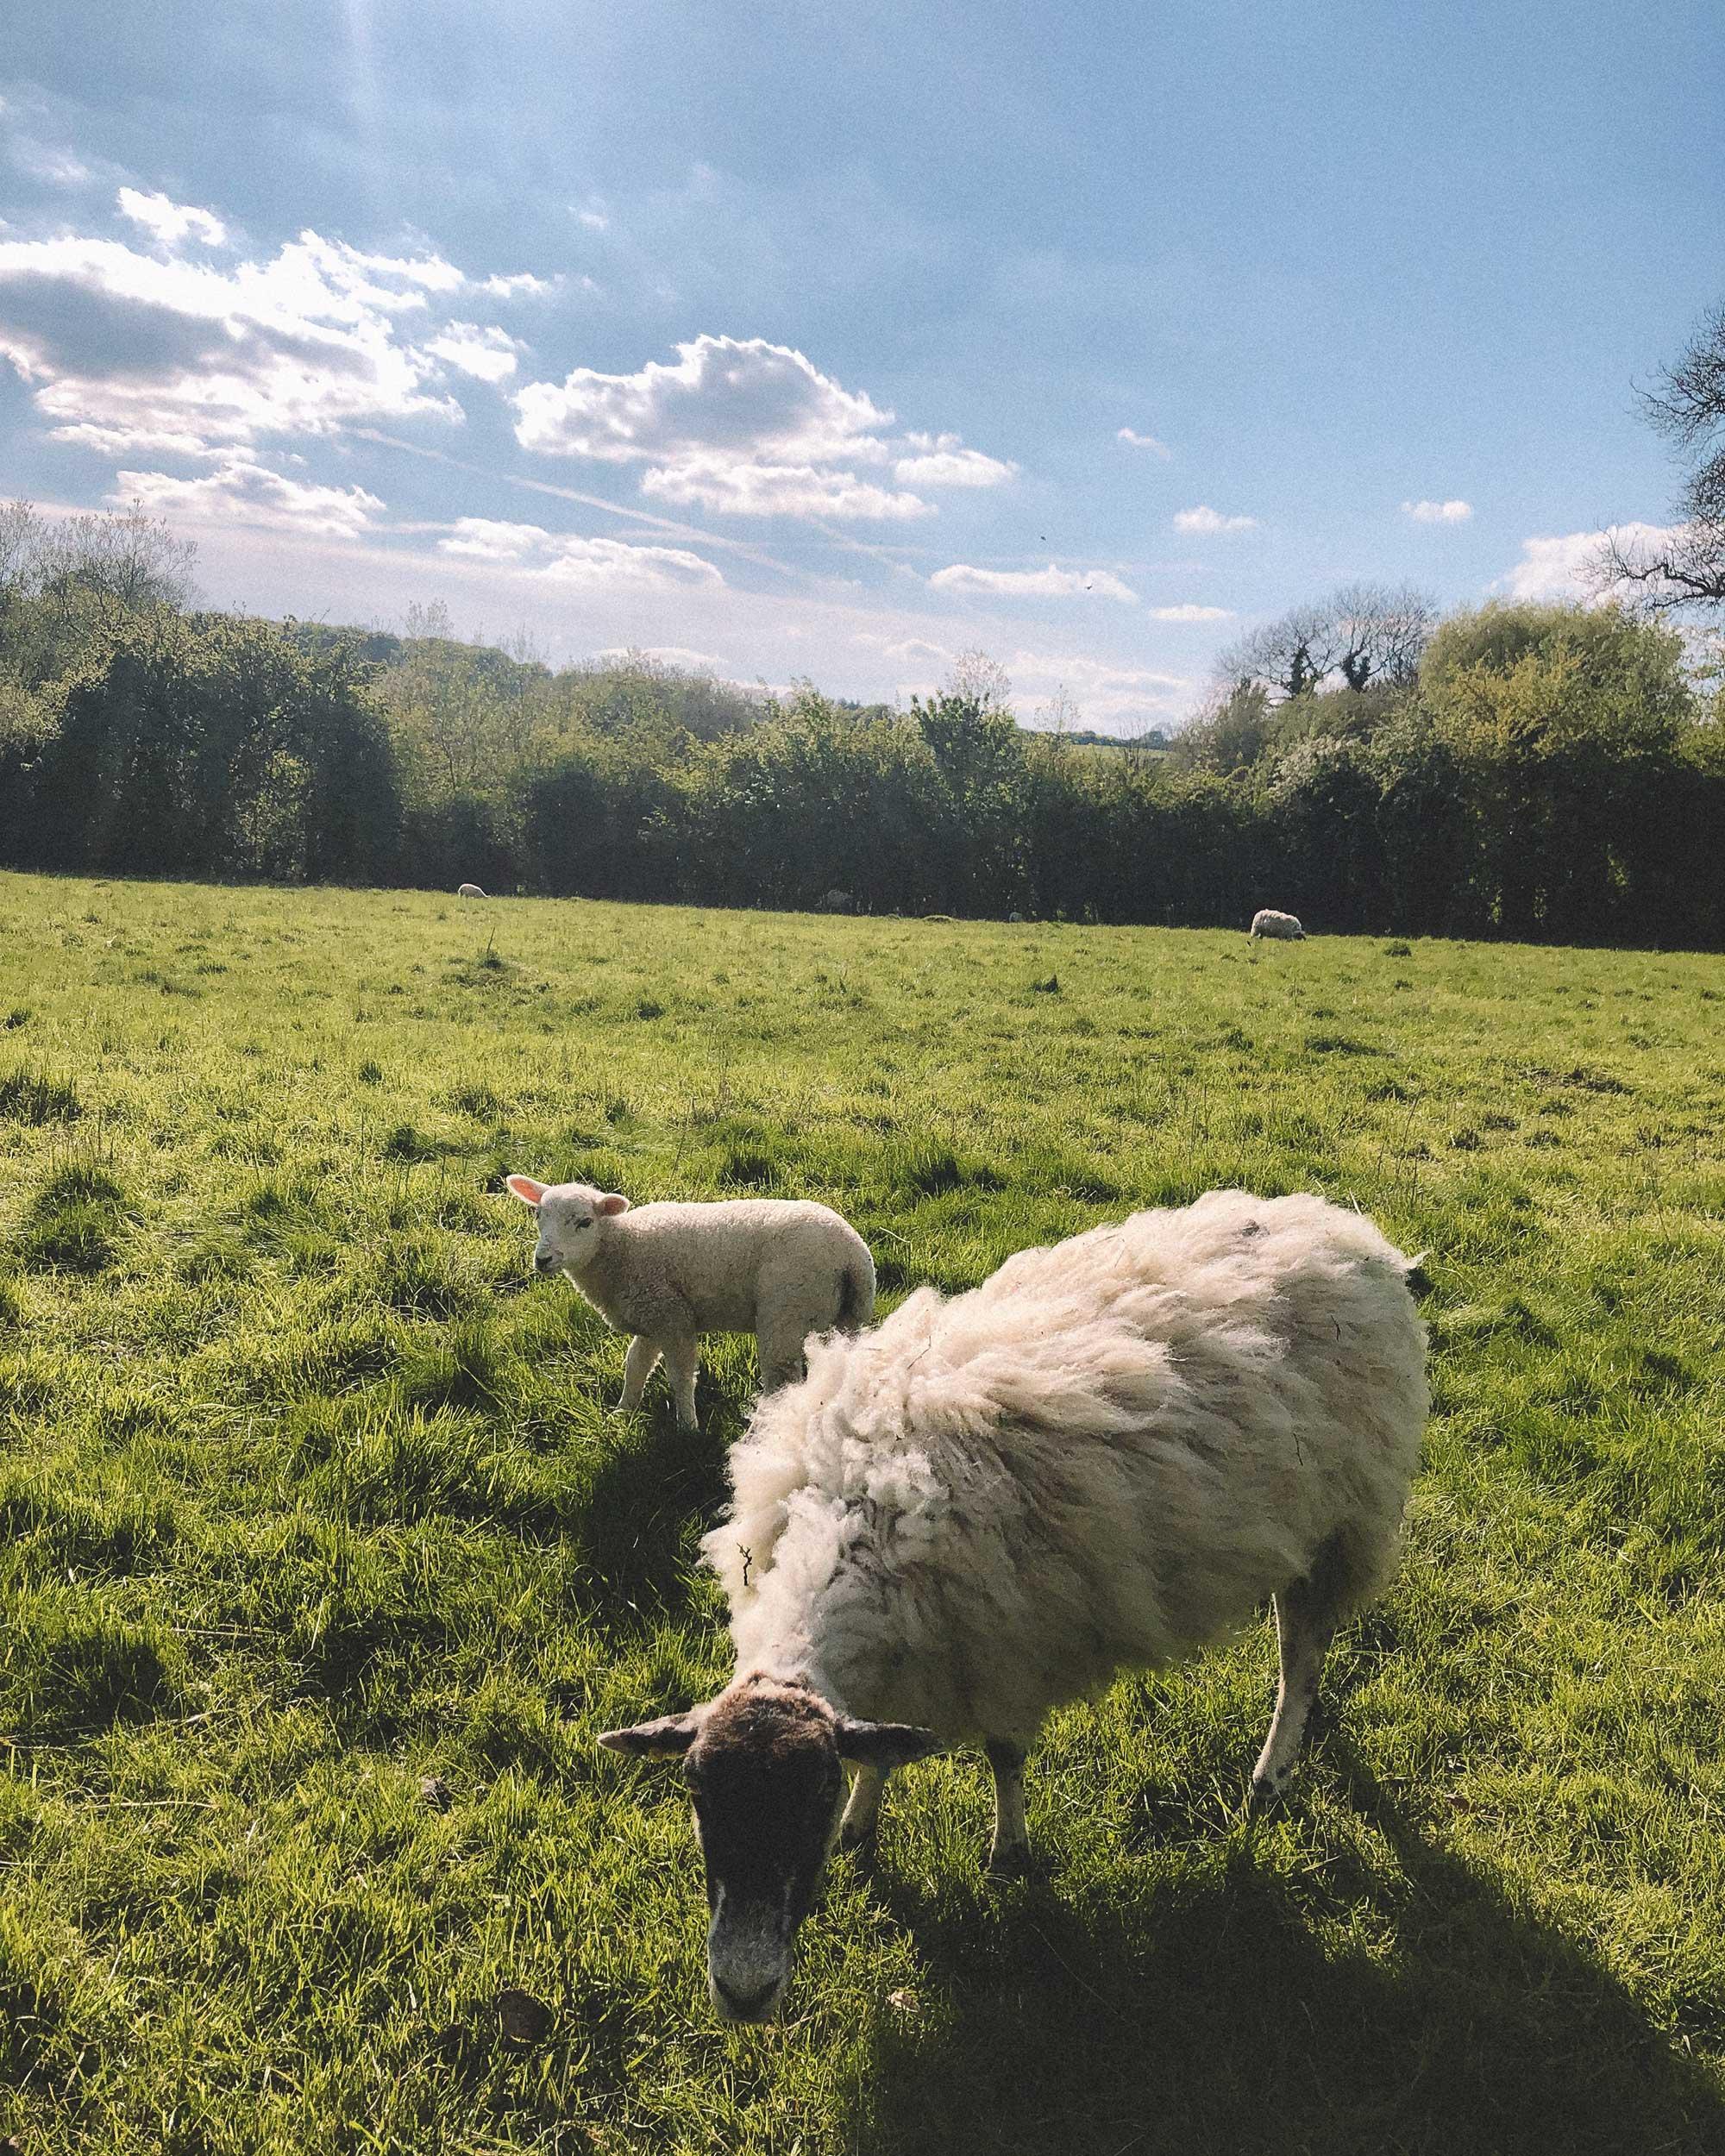 english countryside during spring2.jpg